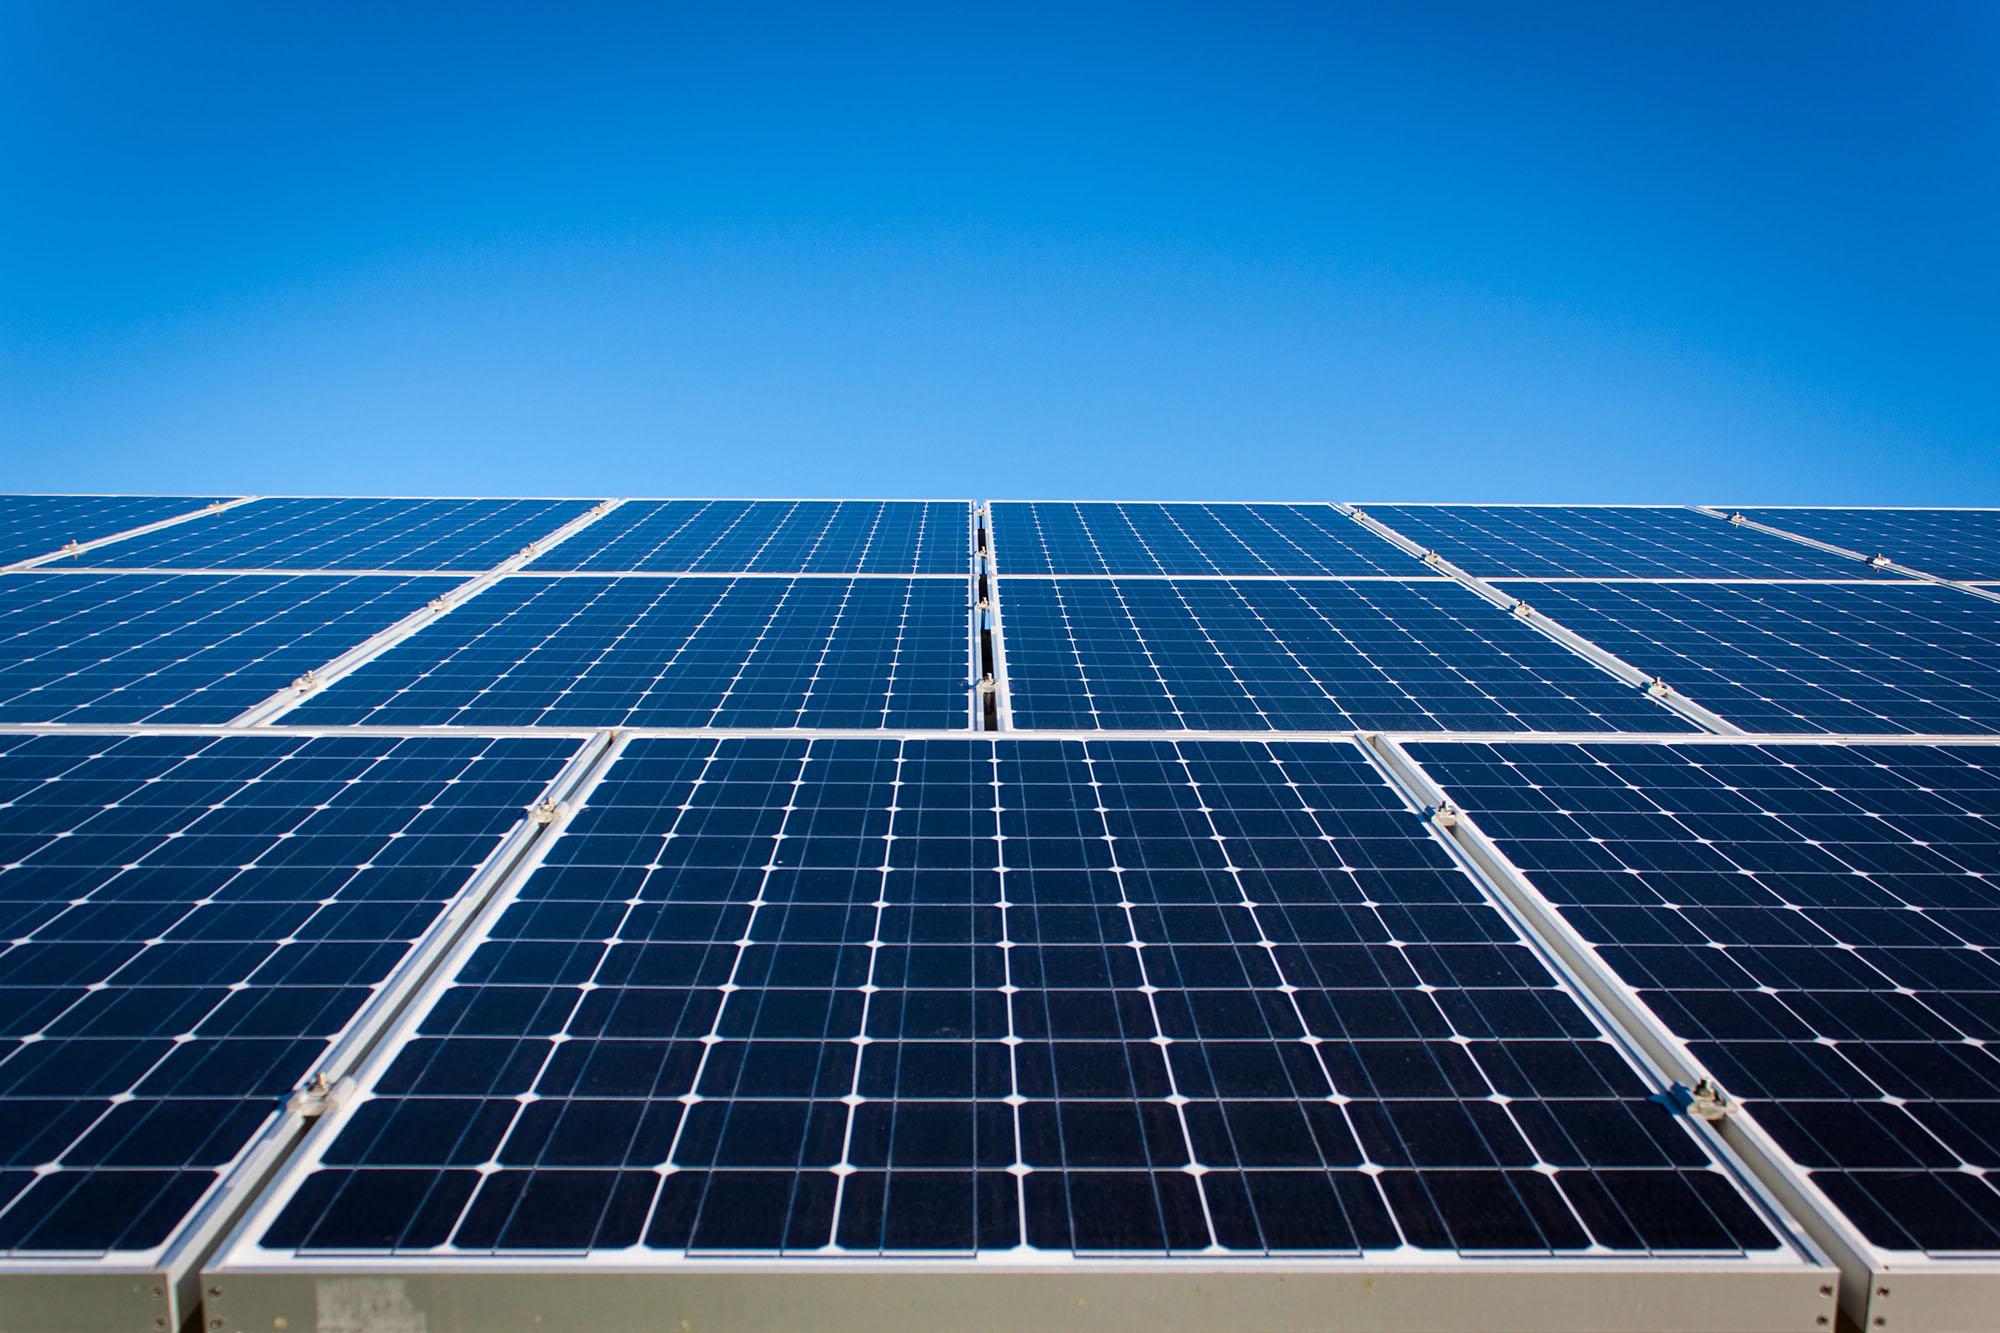 Impianti e sistemi ad alto risparmio energetico